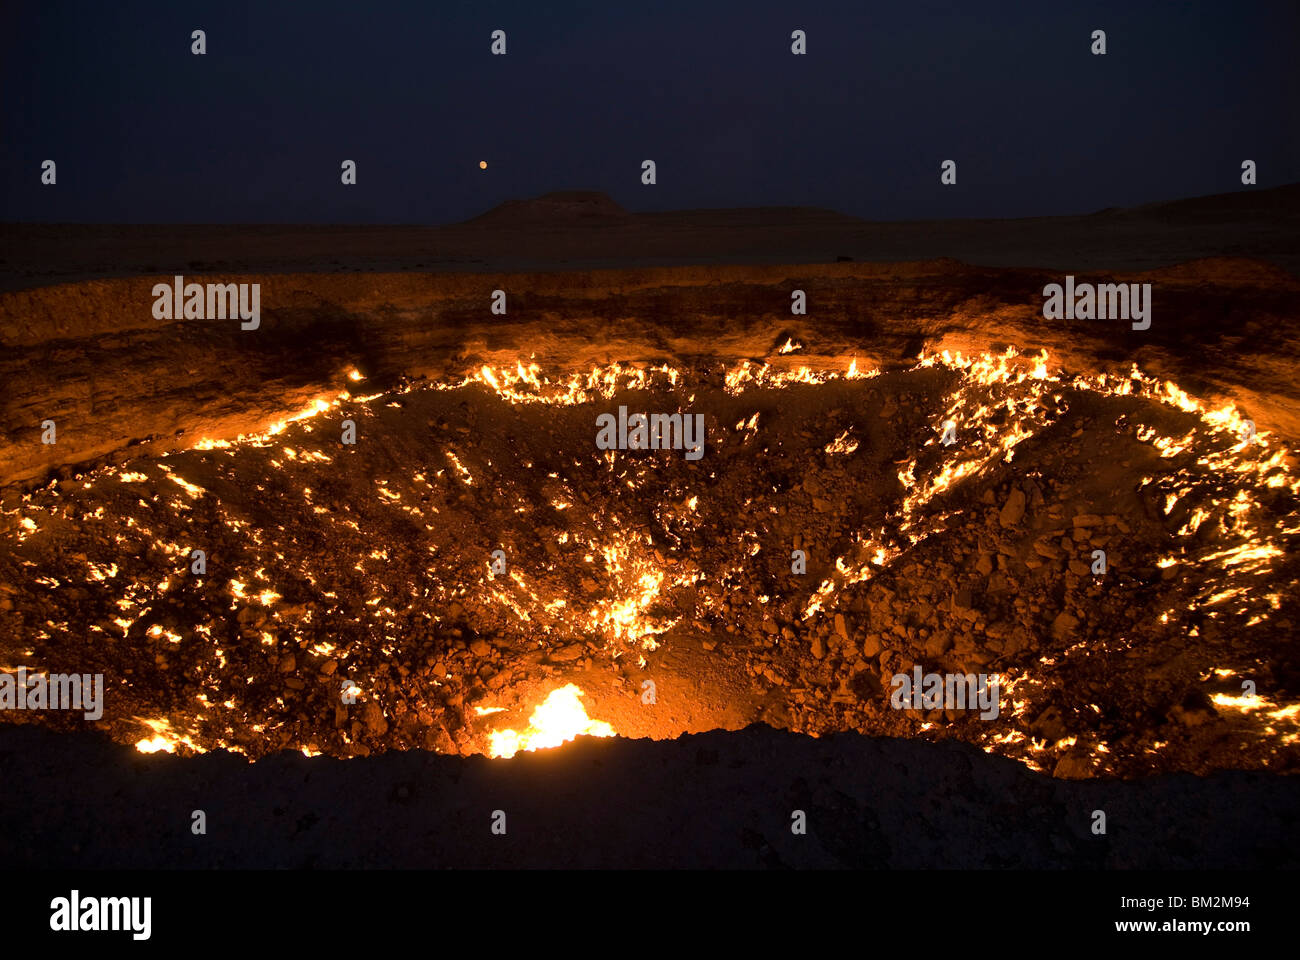 The Darvaza Gas Crater in the Karakol desert, Turkmenistan - Stock Image